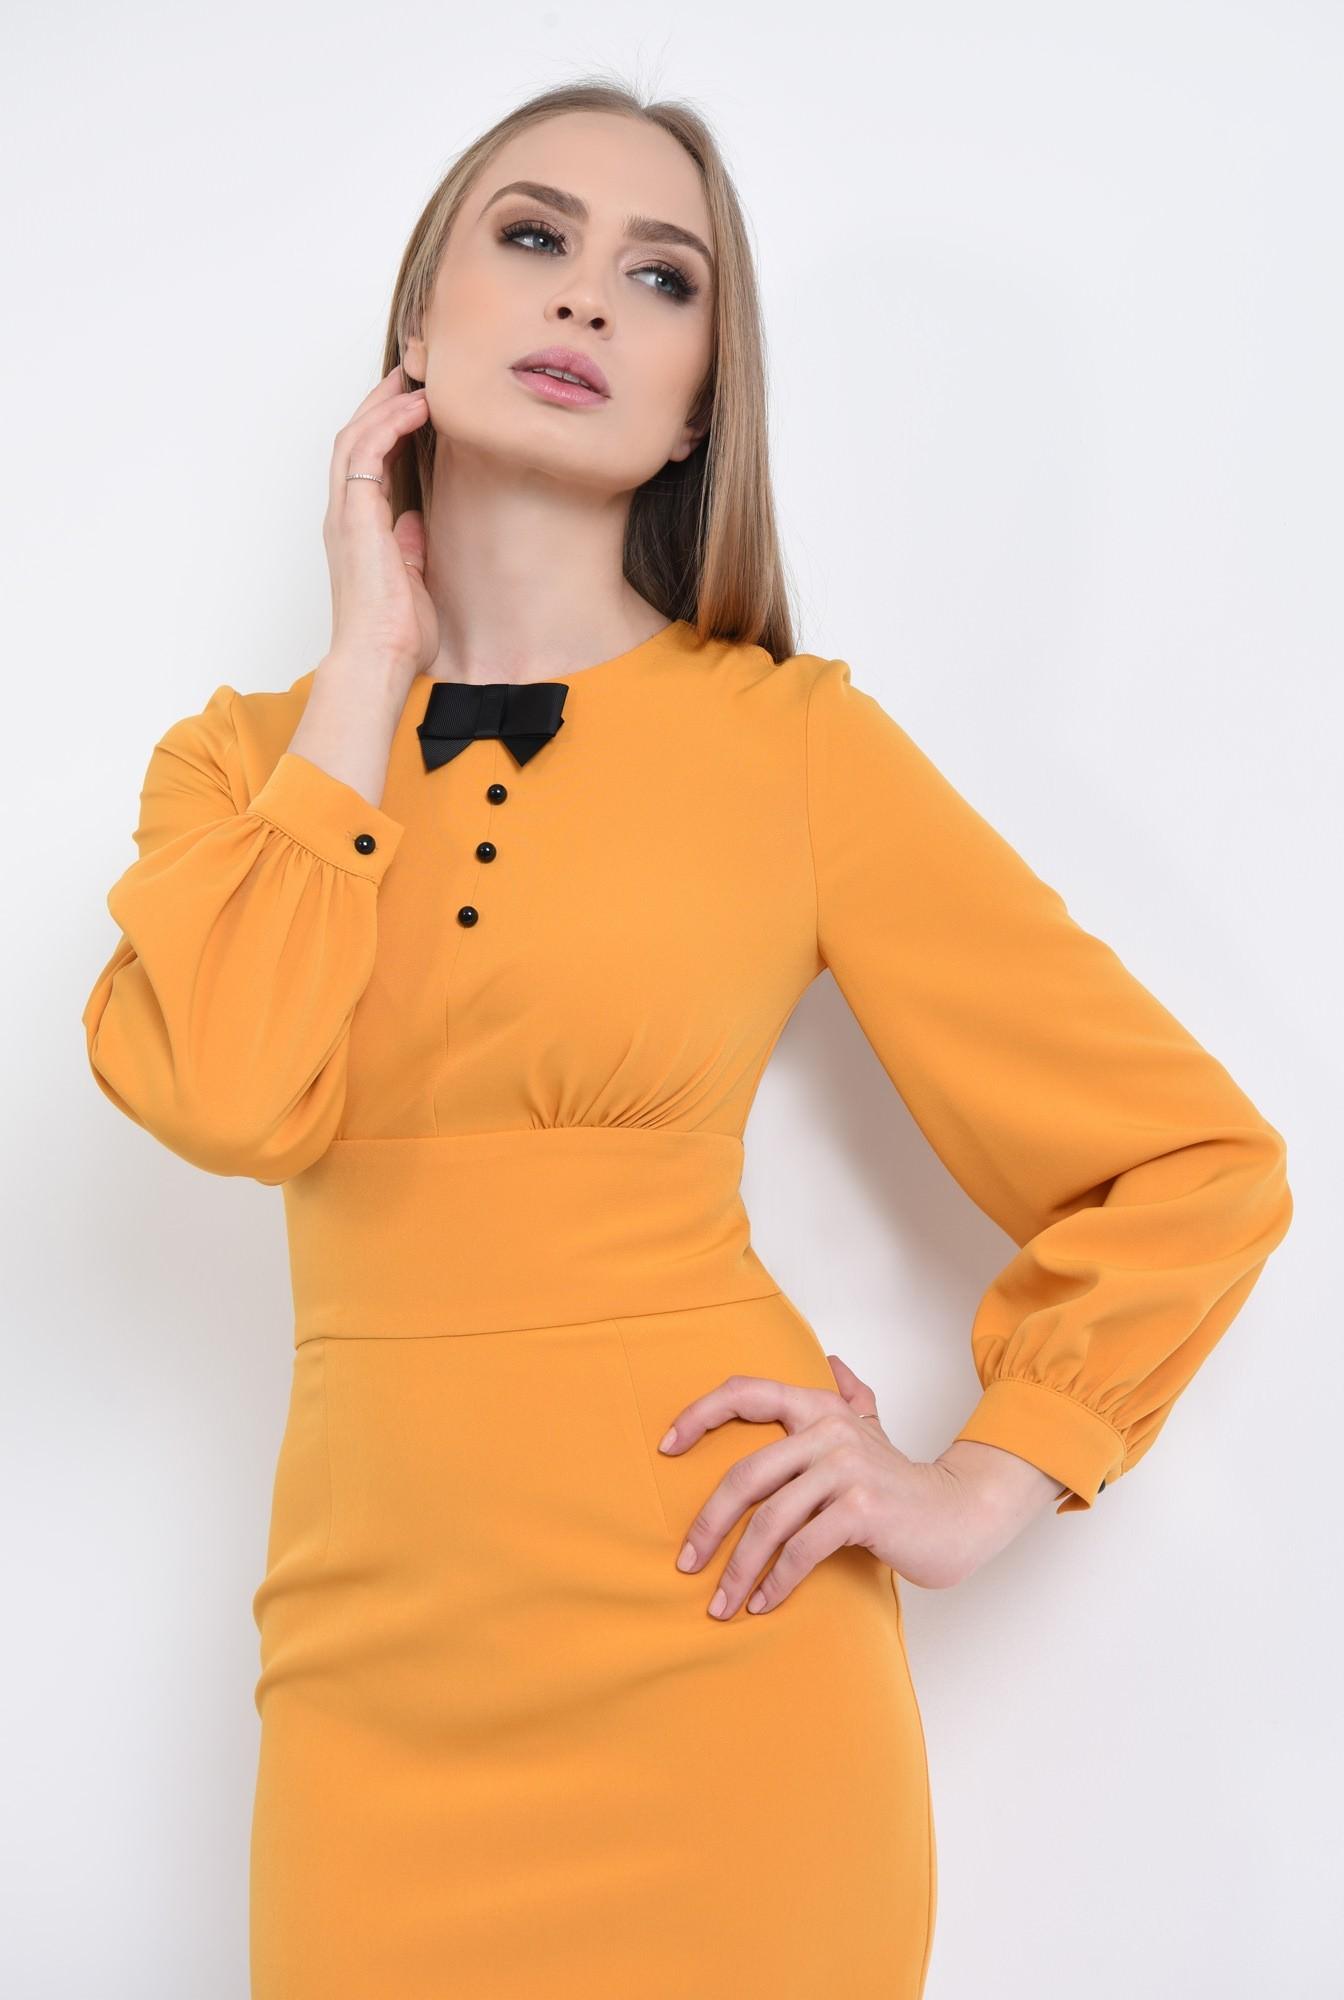 2 - 360 - rochie conica, maneci bufante, mansete, rochii online, funda, nasturi, contrast